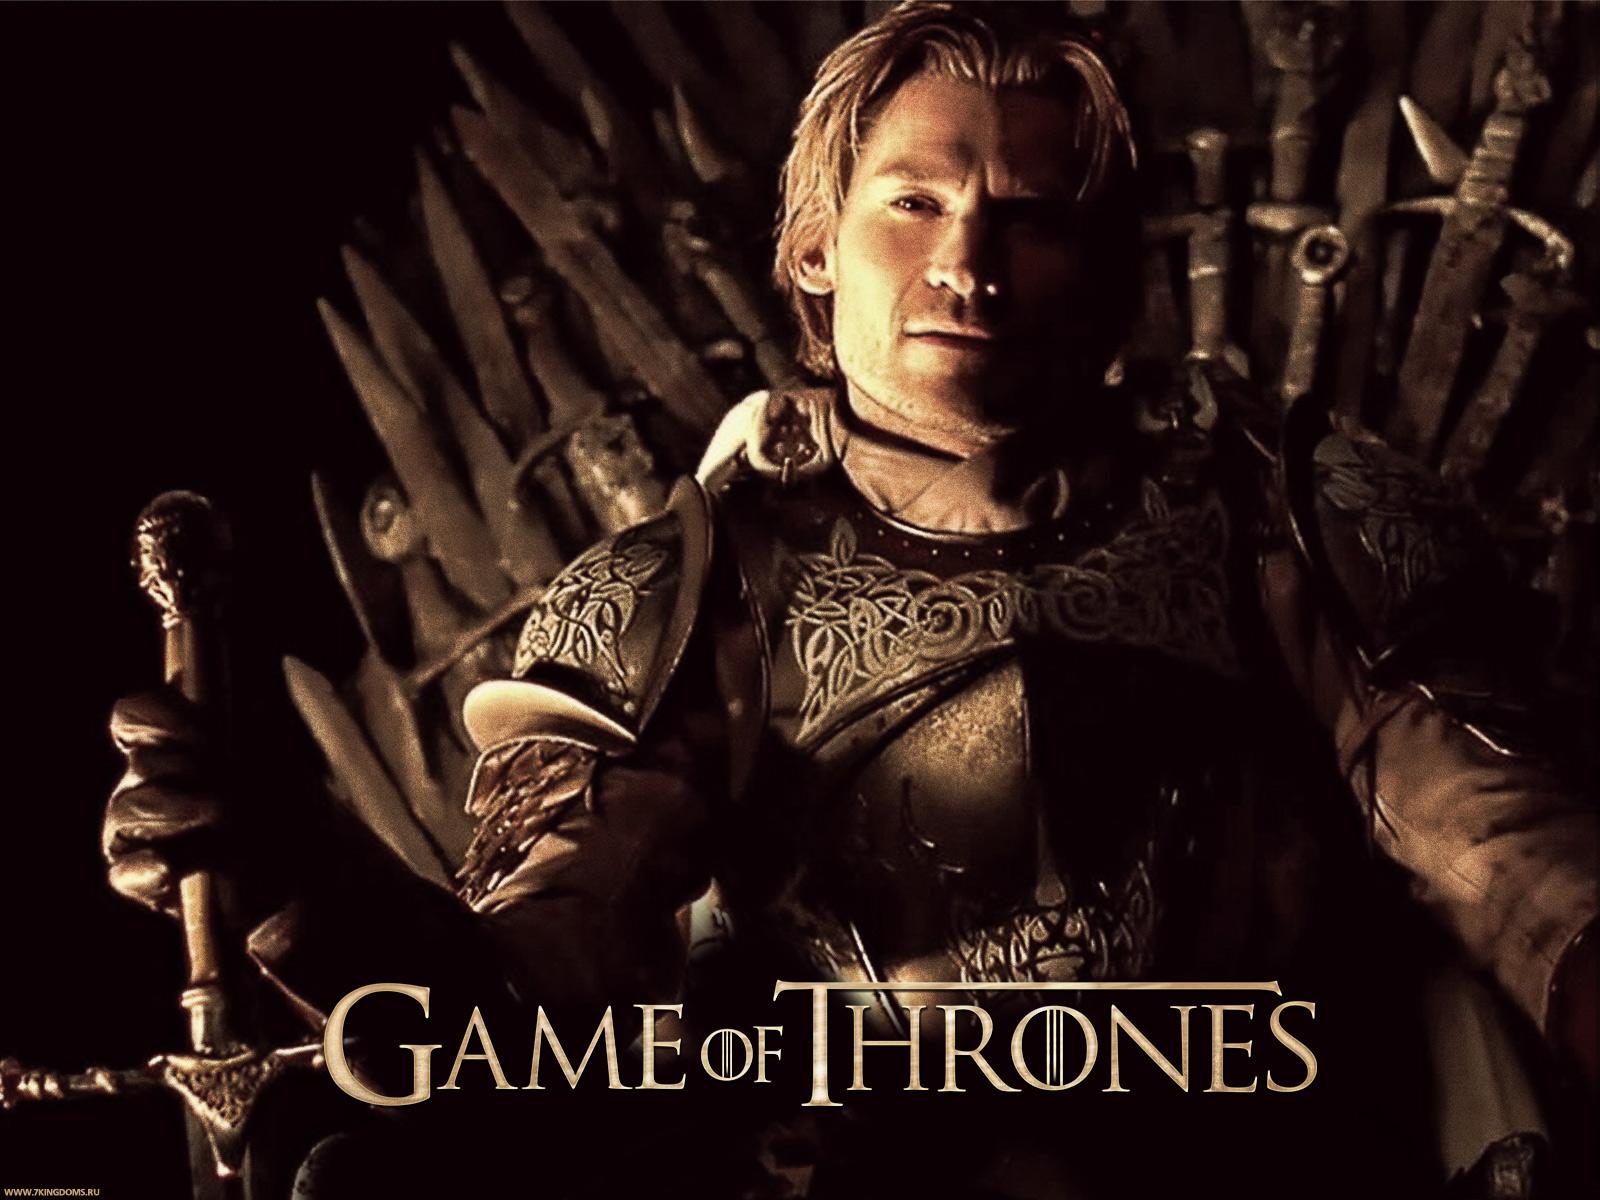 Jamie Game Of Thrones Jaime Lannister Game Of Thrones Jaime Cersei And Jaime